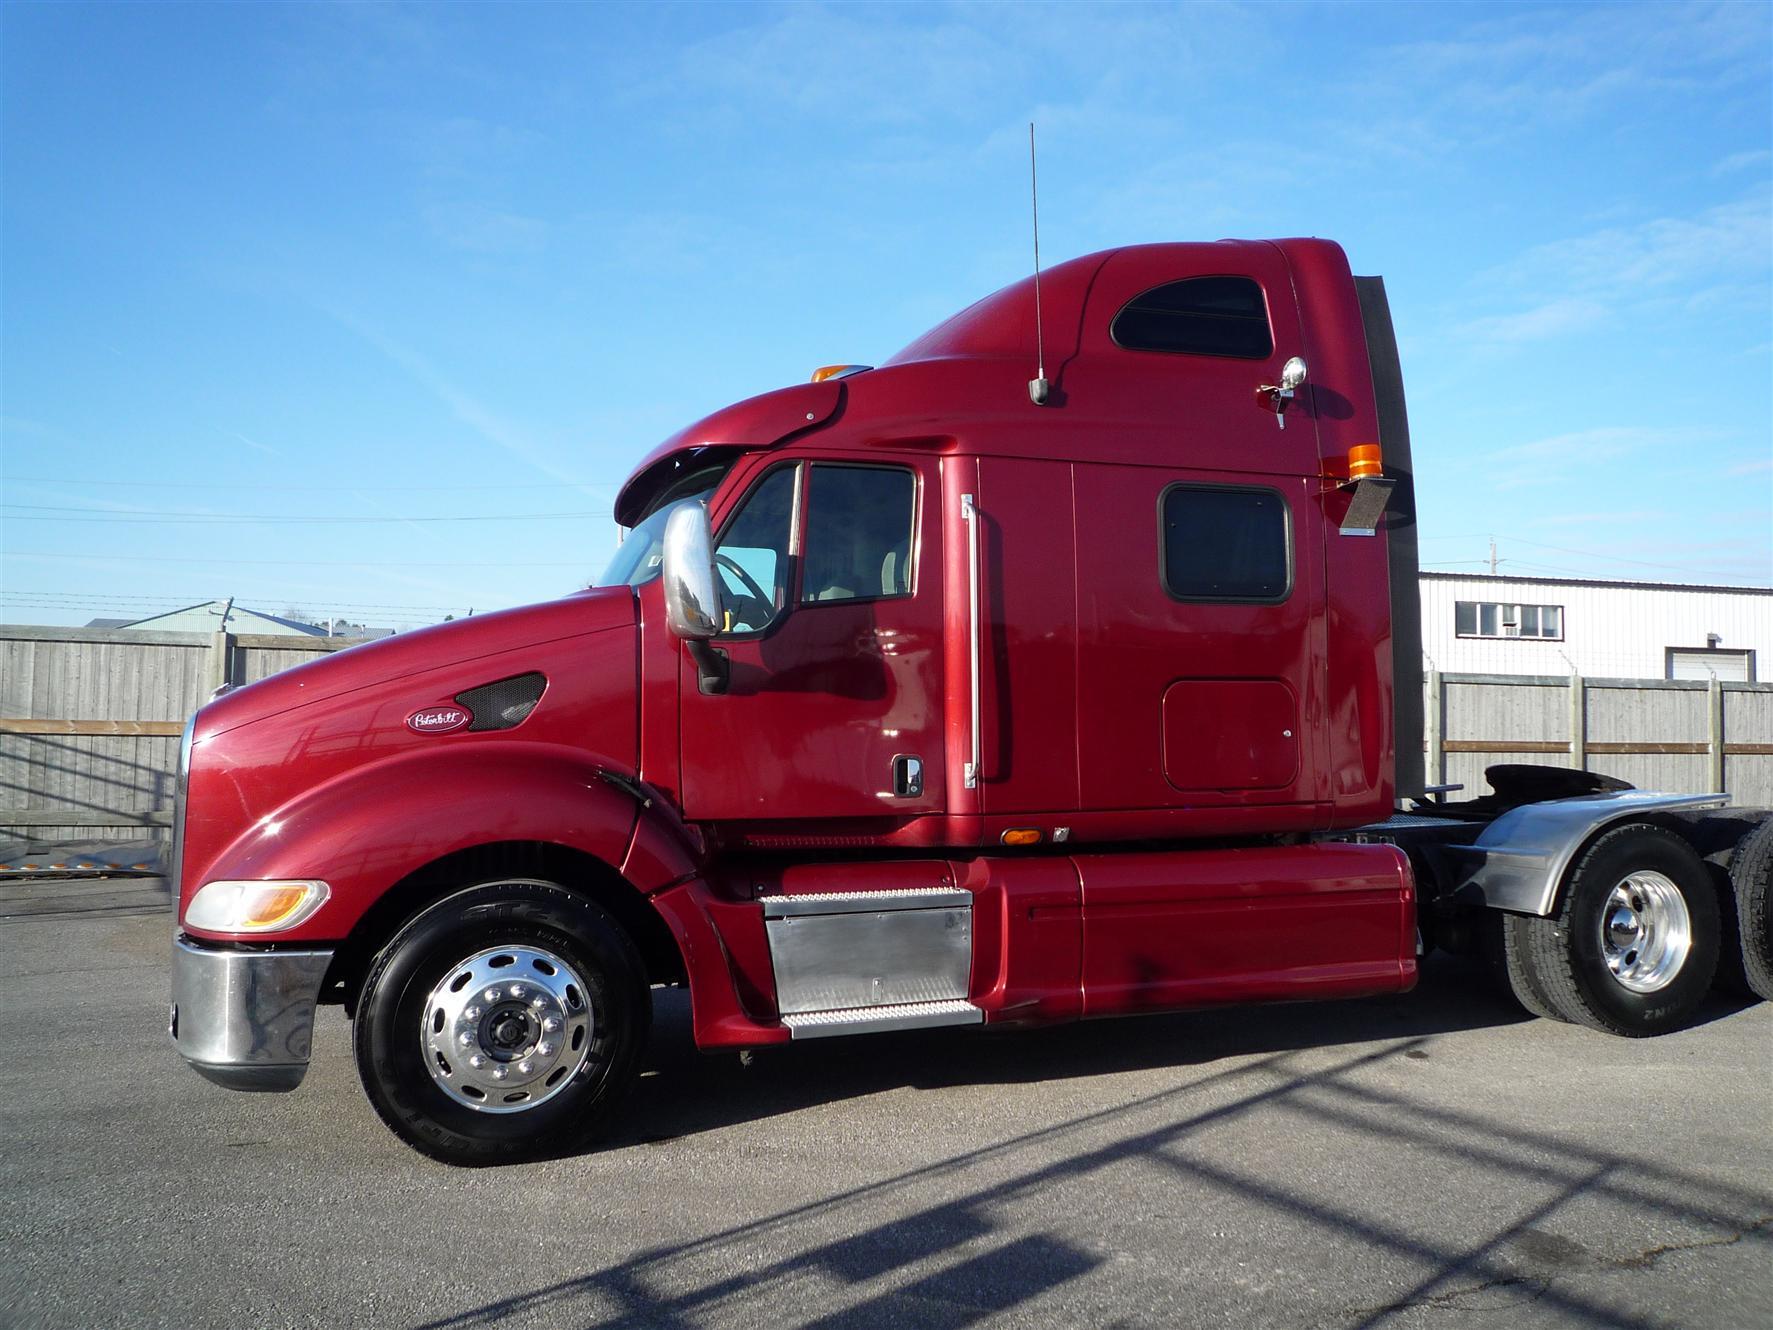 362 Peterbilt Show Trucks